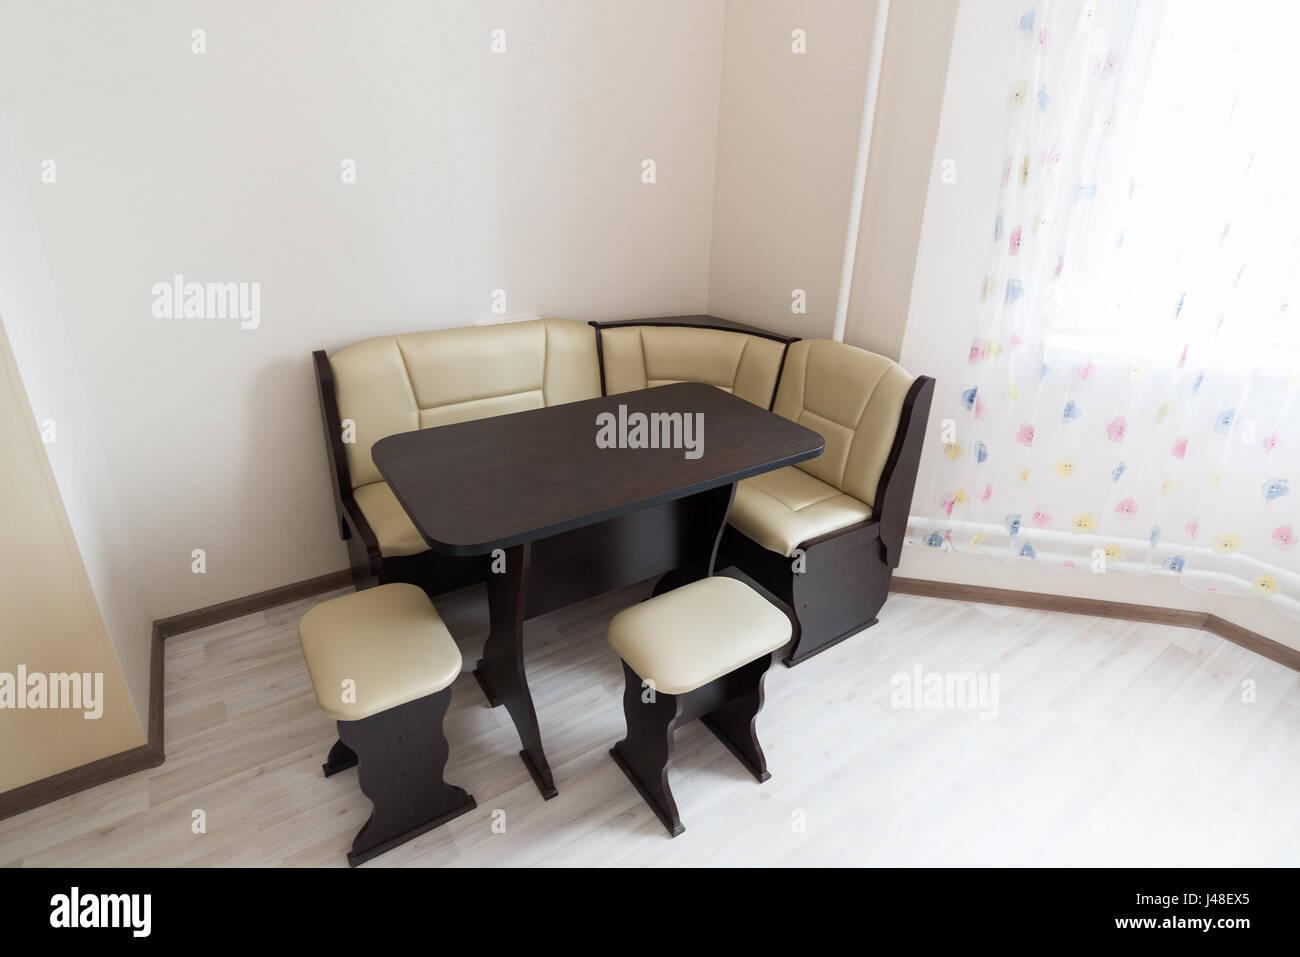 Kitchen corner sofa and table in interior Stock Photo - Alamy